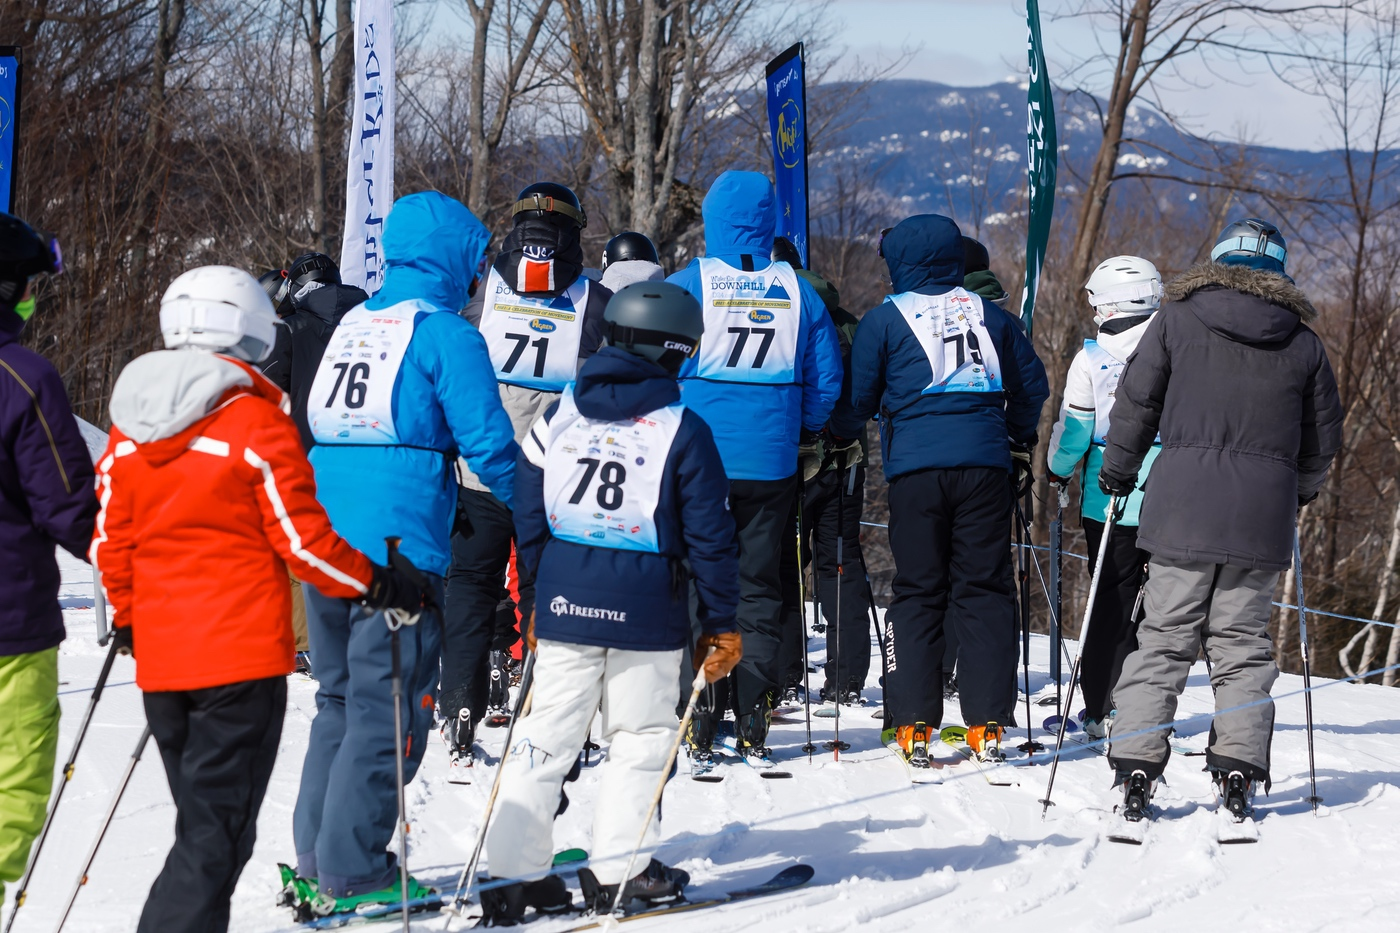 WinterKids Downhill 24 2021 SDP 3251